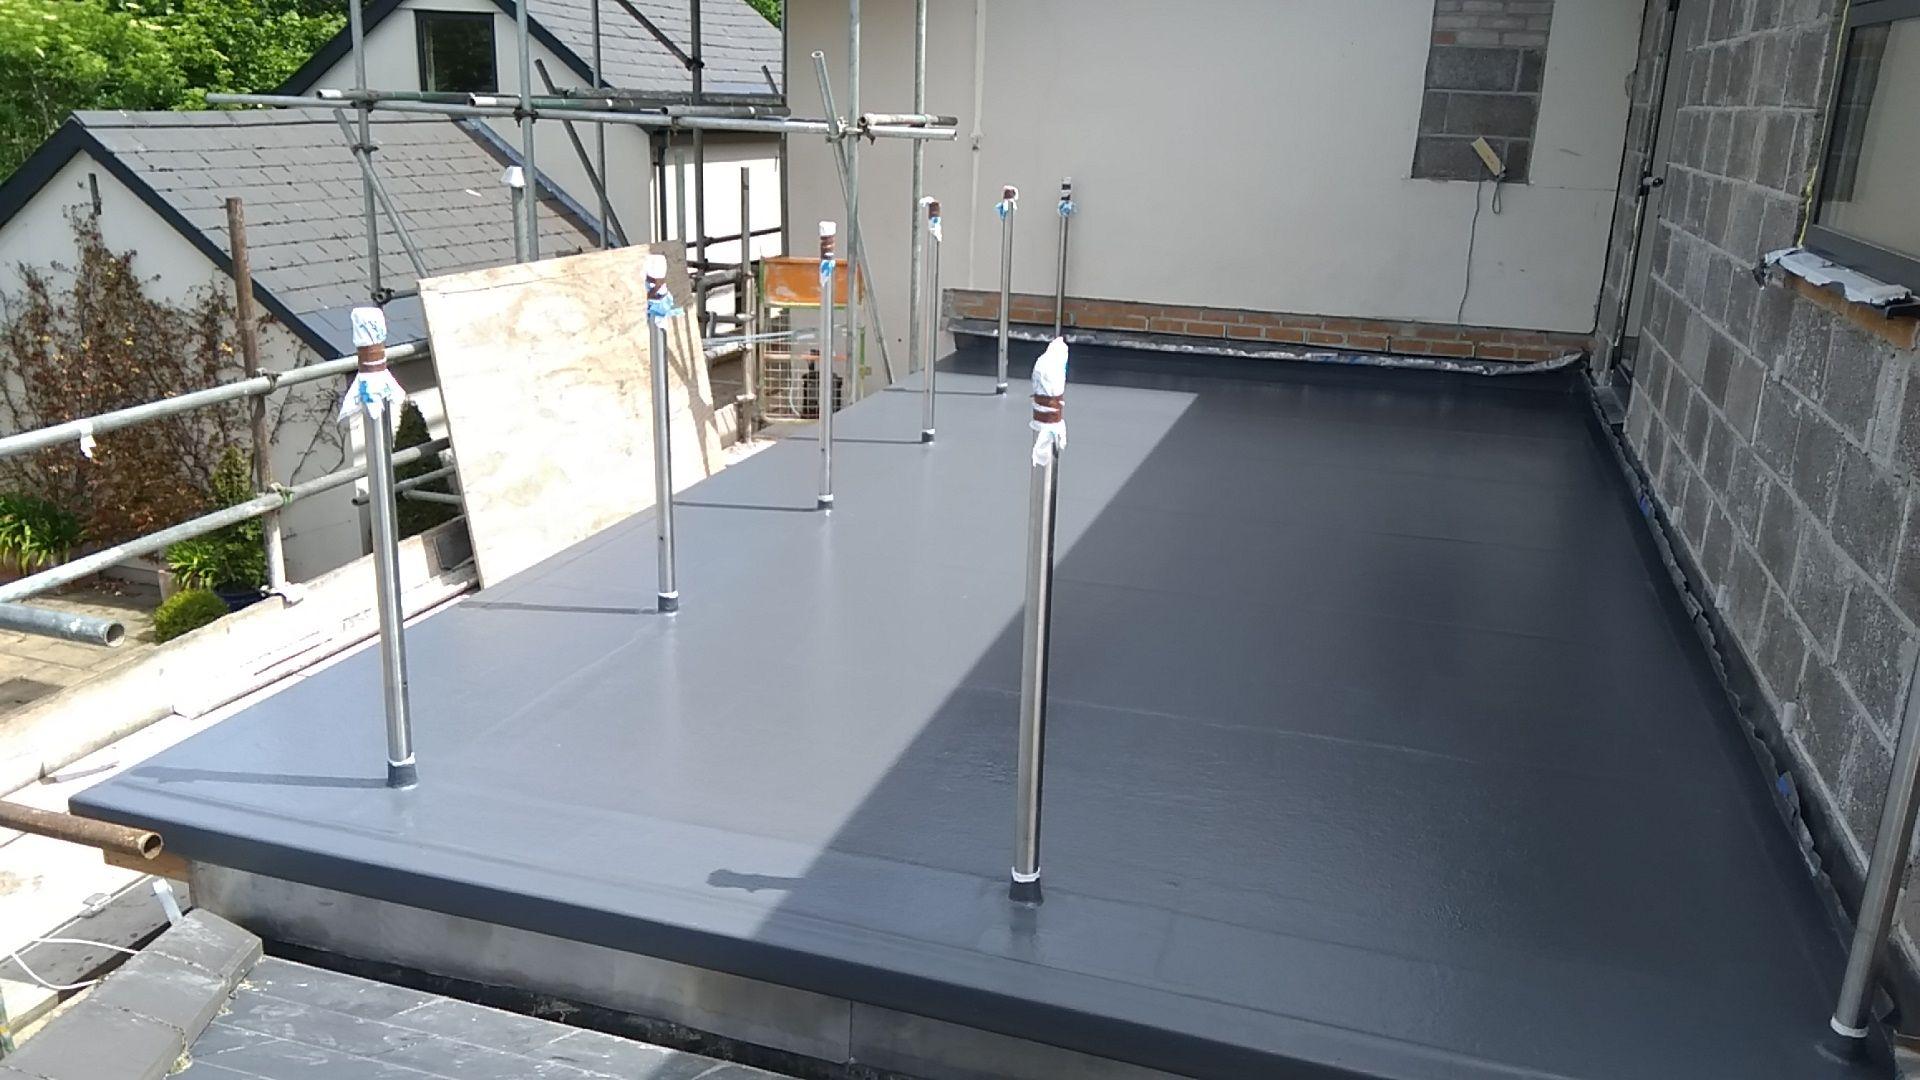 Grey fibreglass flat roof with handrail posts.